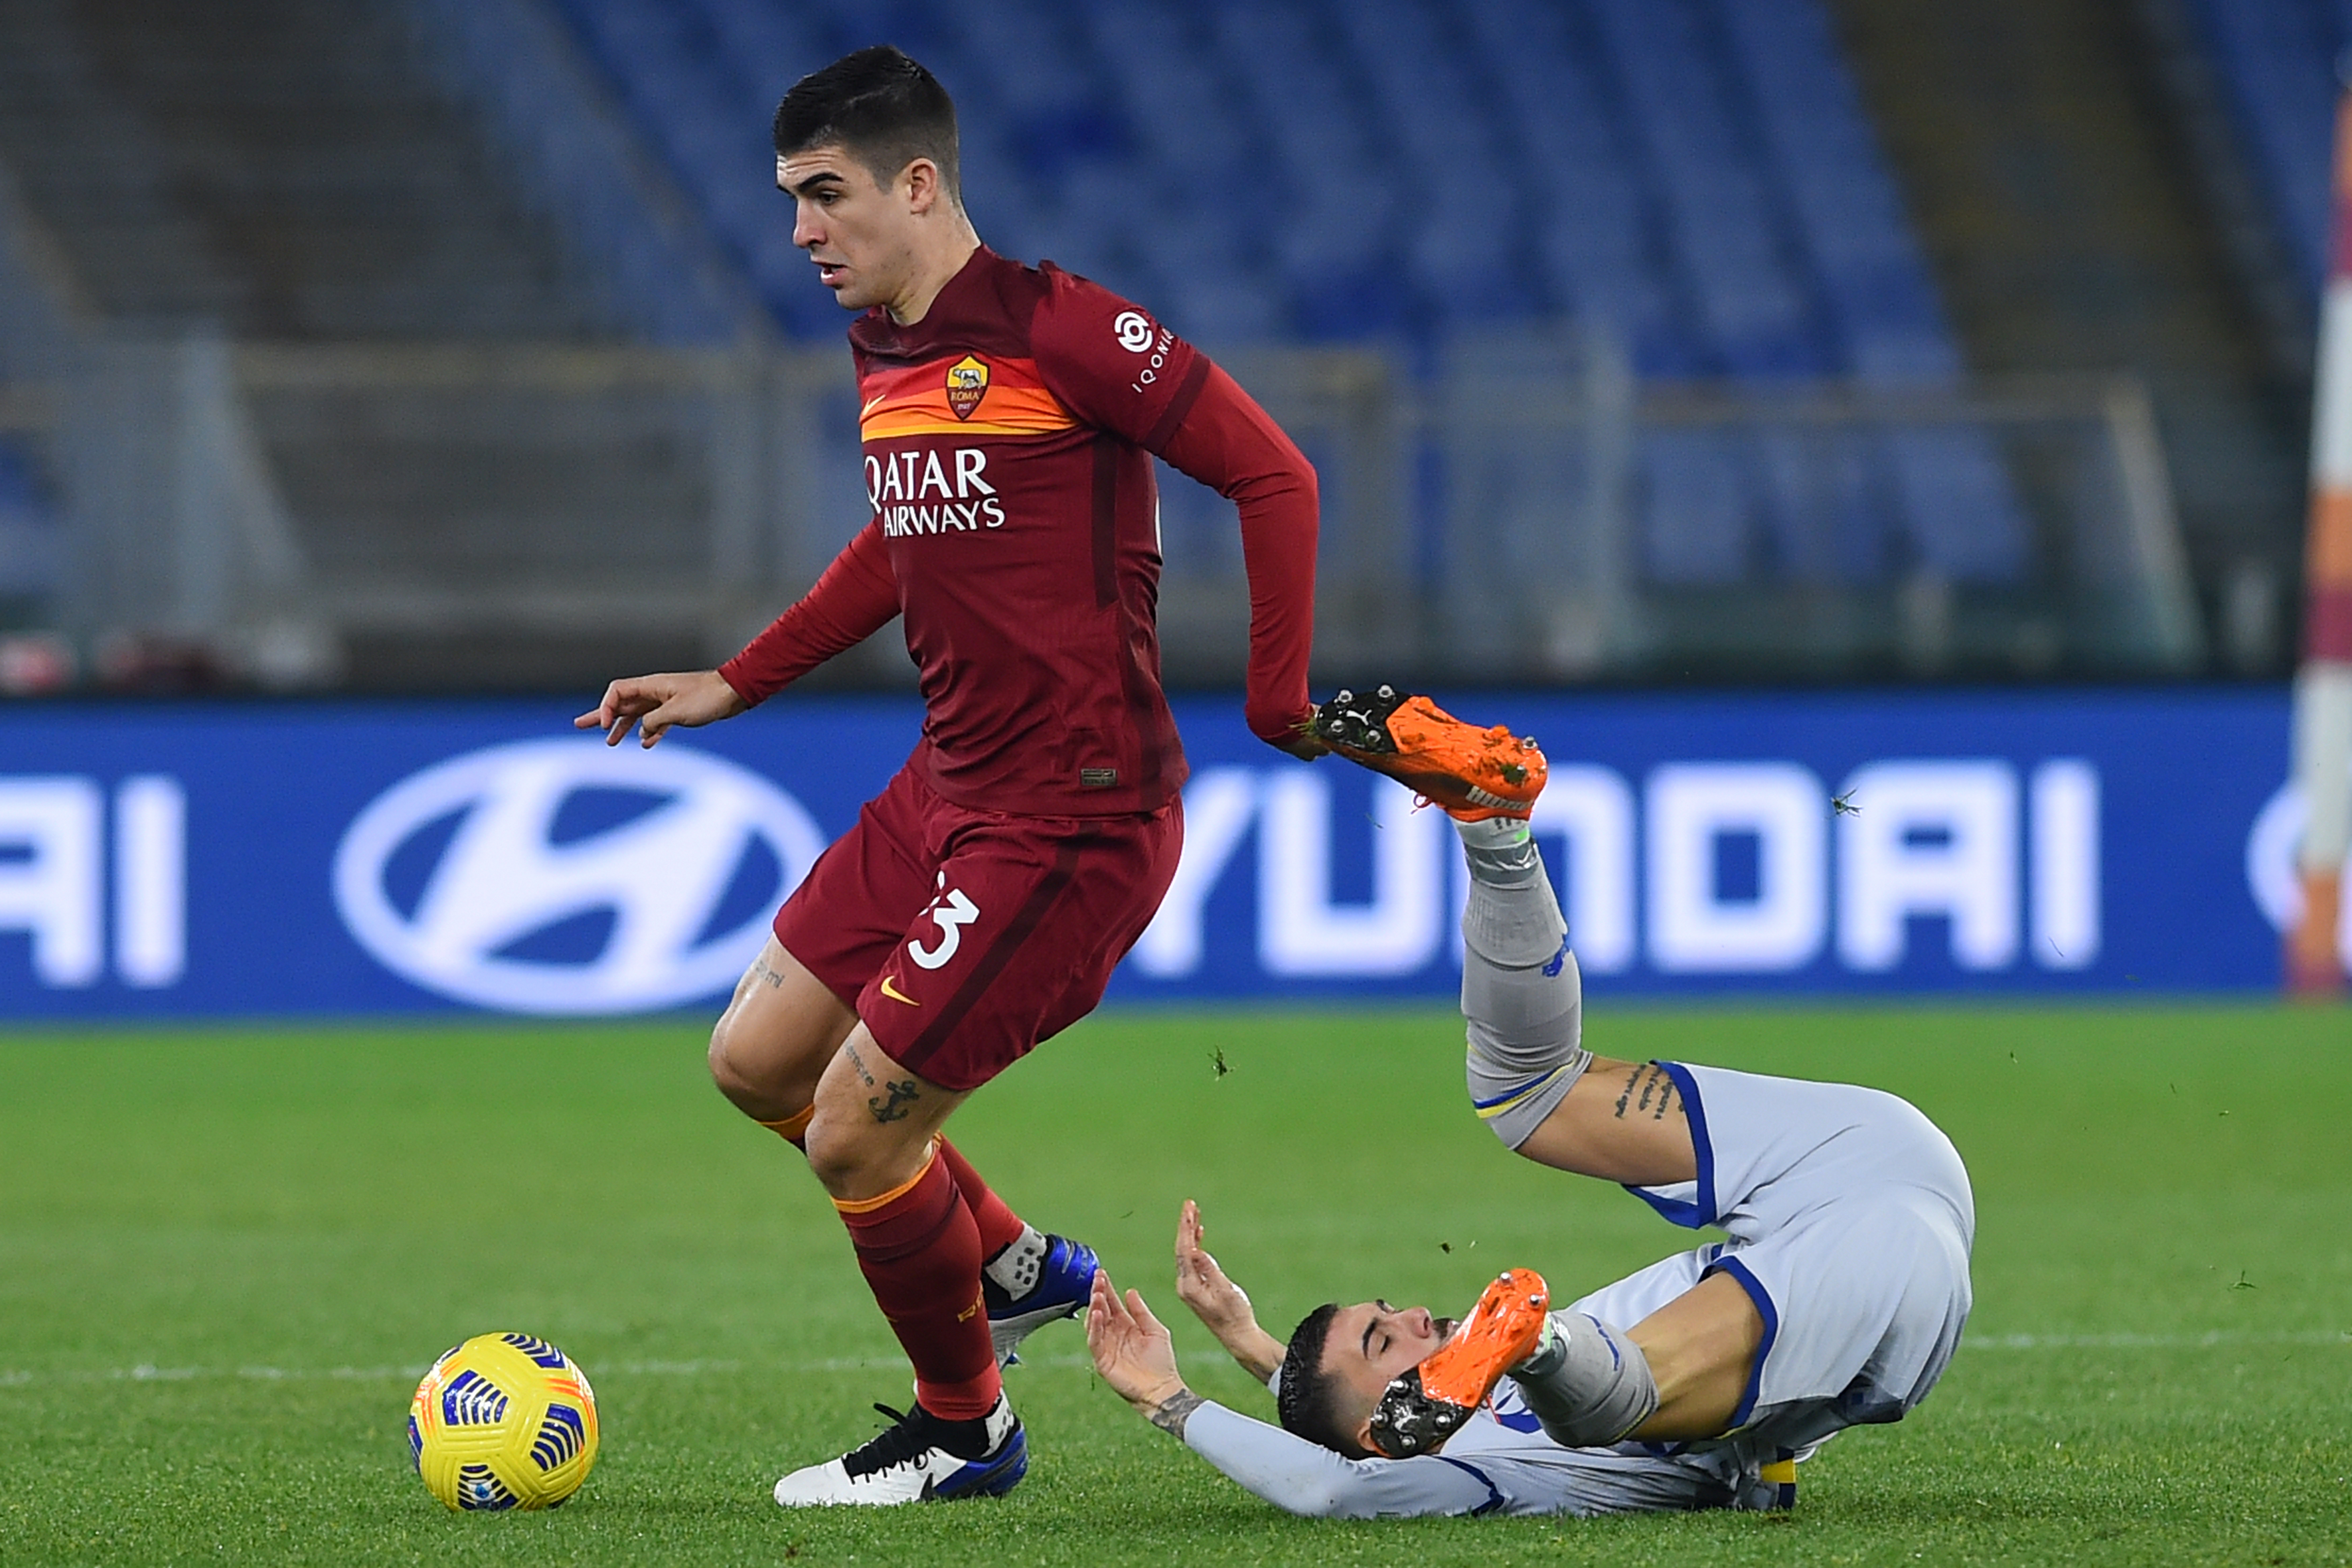 Football Serie A As Roma-Hellas Verona